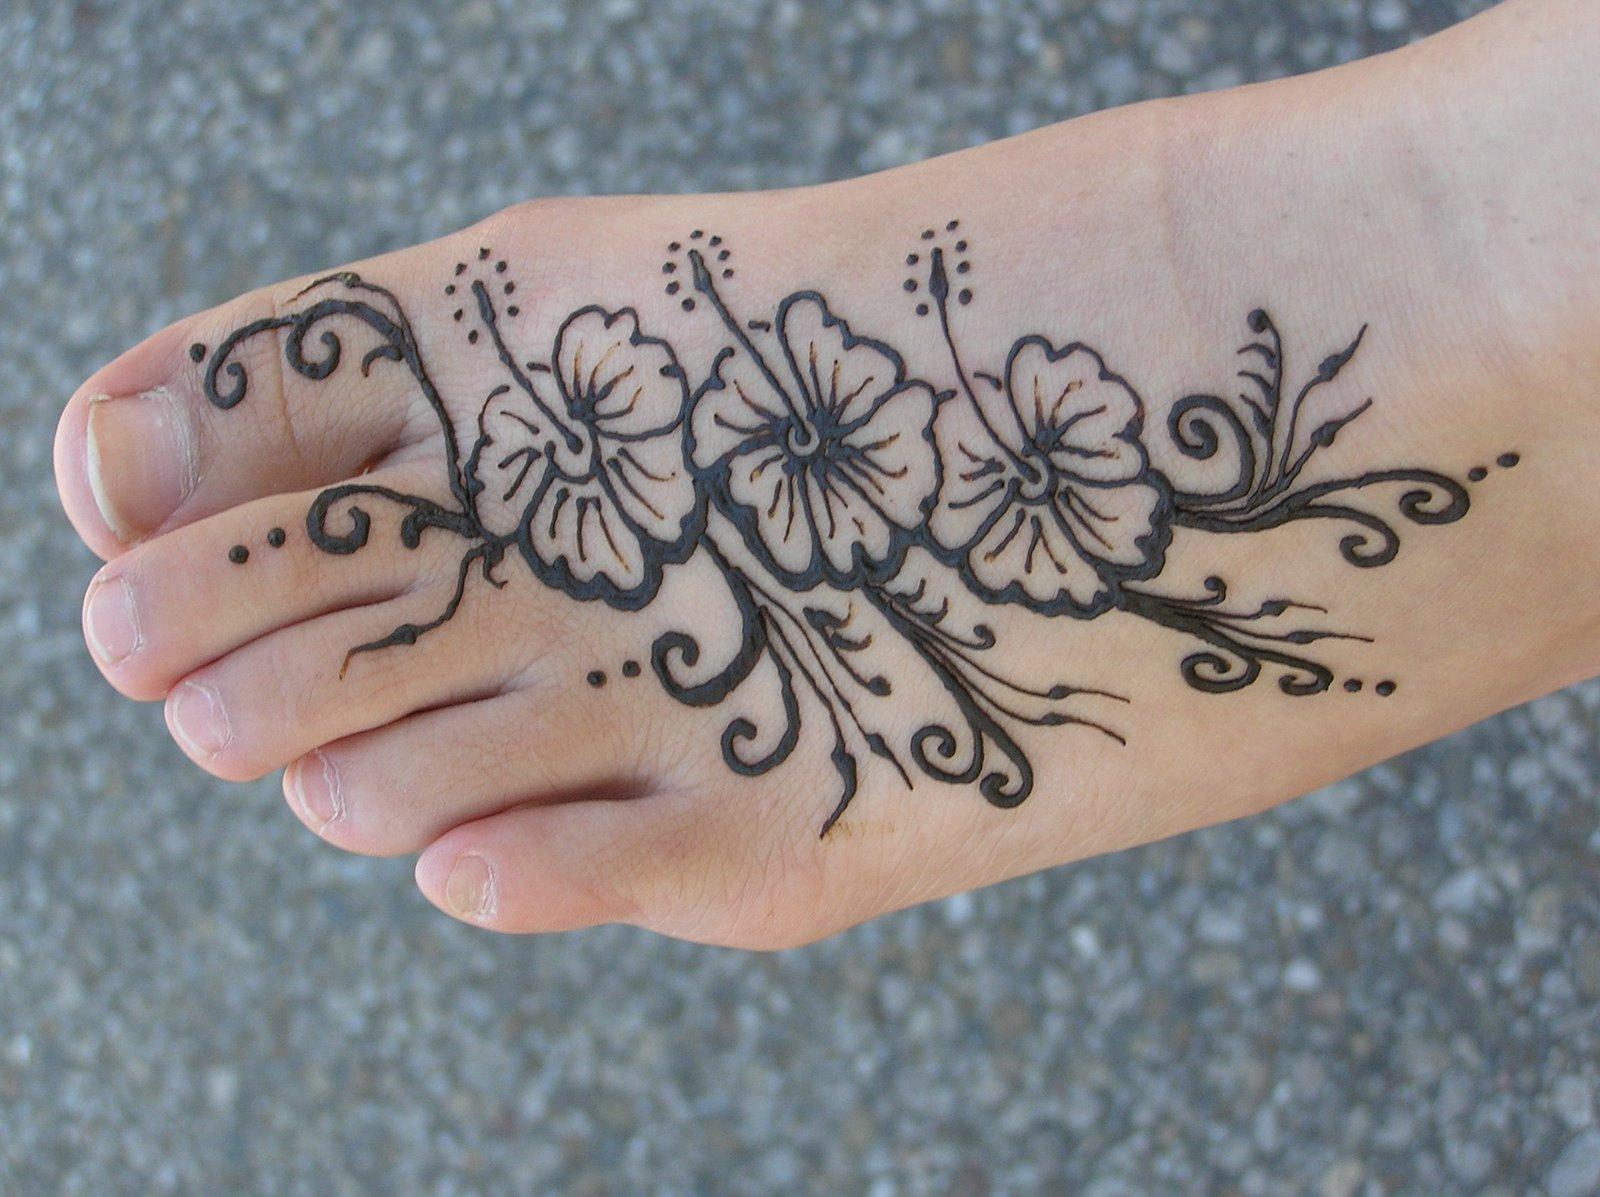 Lipby Sevenfold Beautiful Rose Tattoo Design For Women